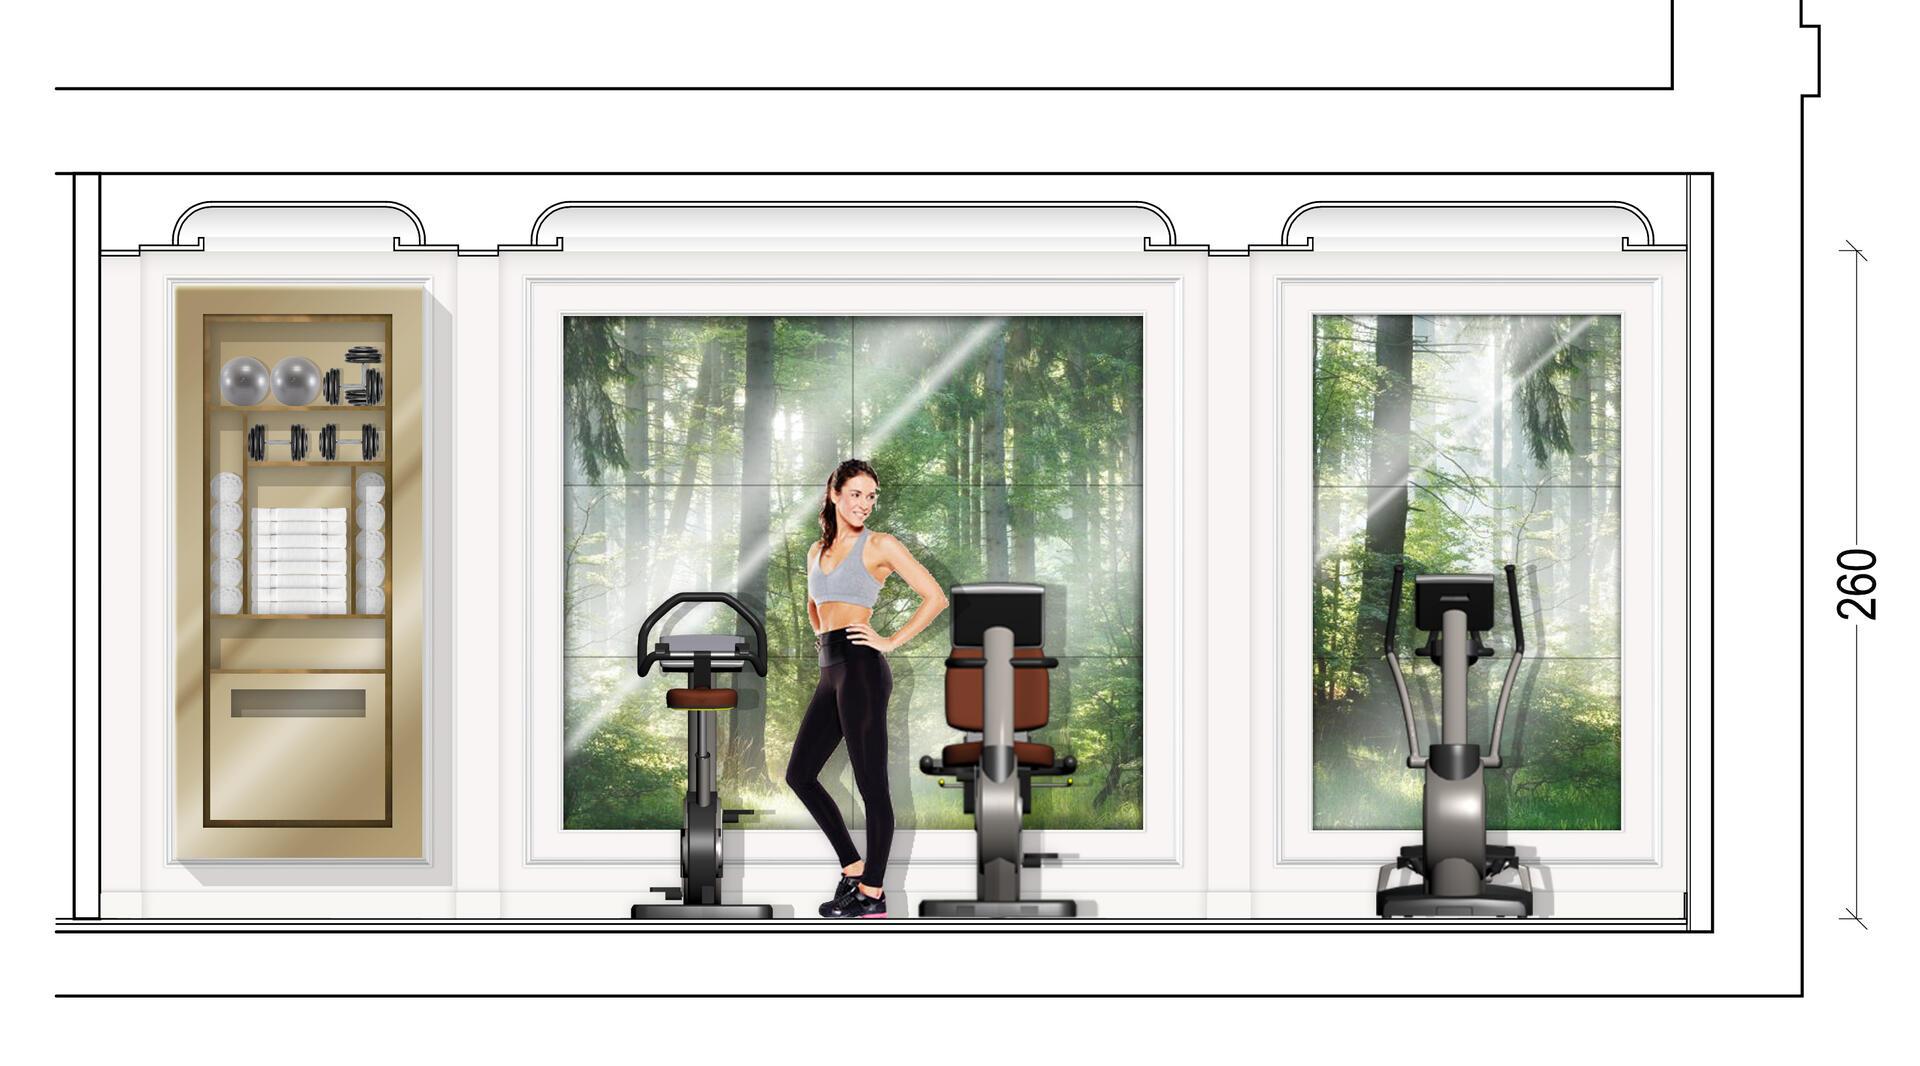 An illustration of the fitness center at Hotel Keppler Paris.